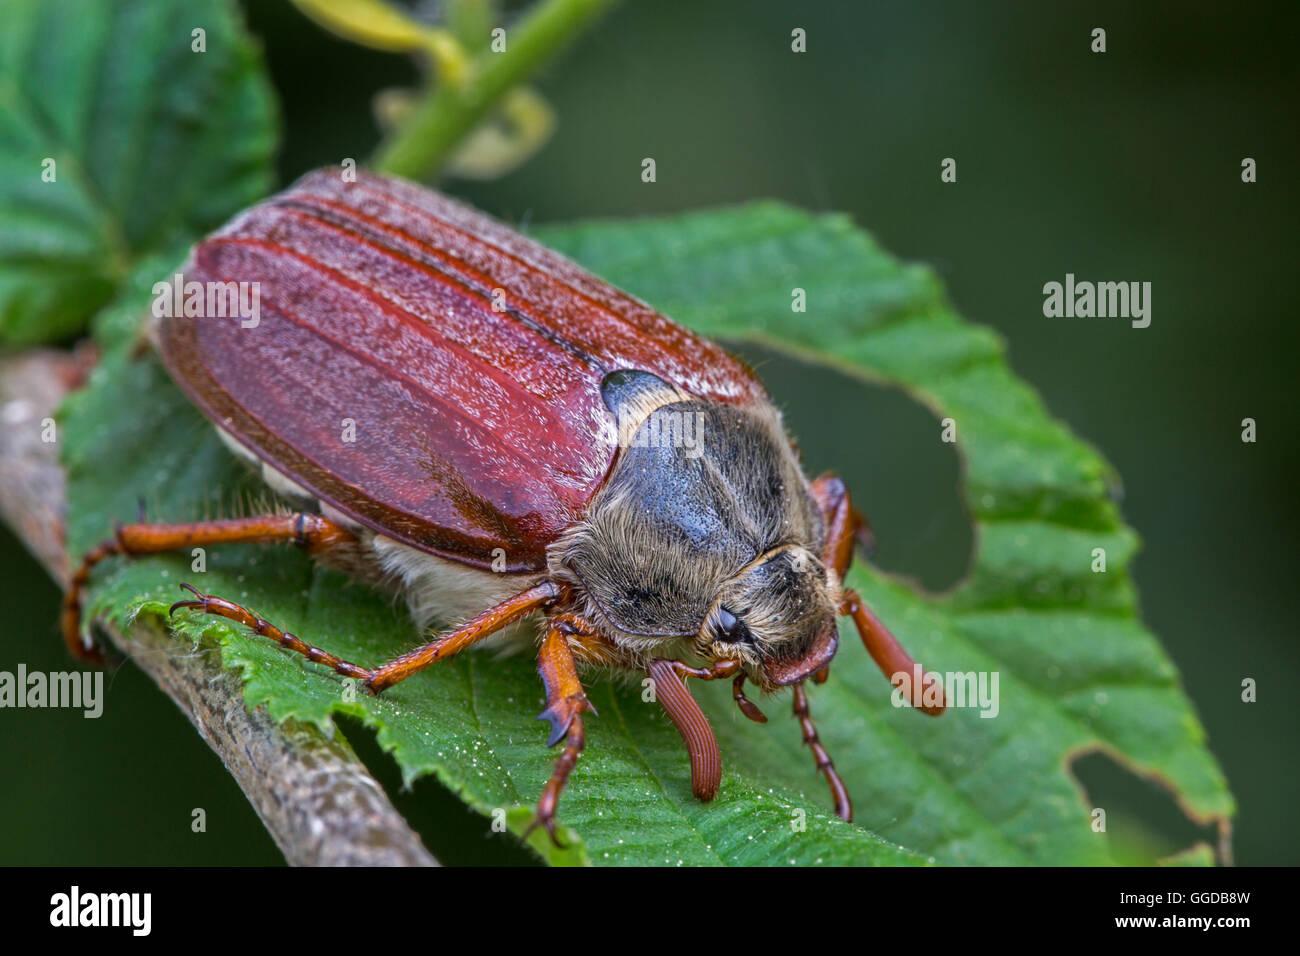 / Mayo cockchafer común (Melolontha melolontha bug) en la hoja Foto de stock